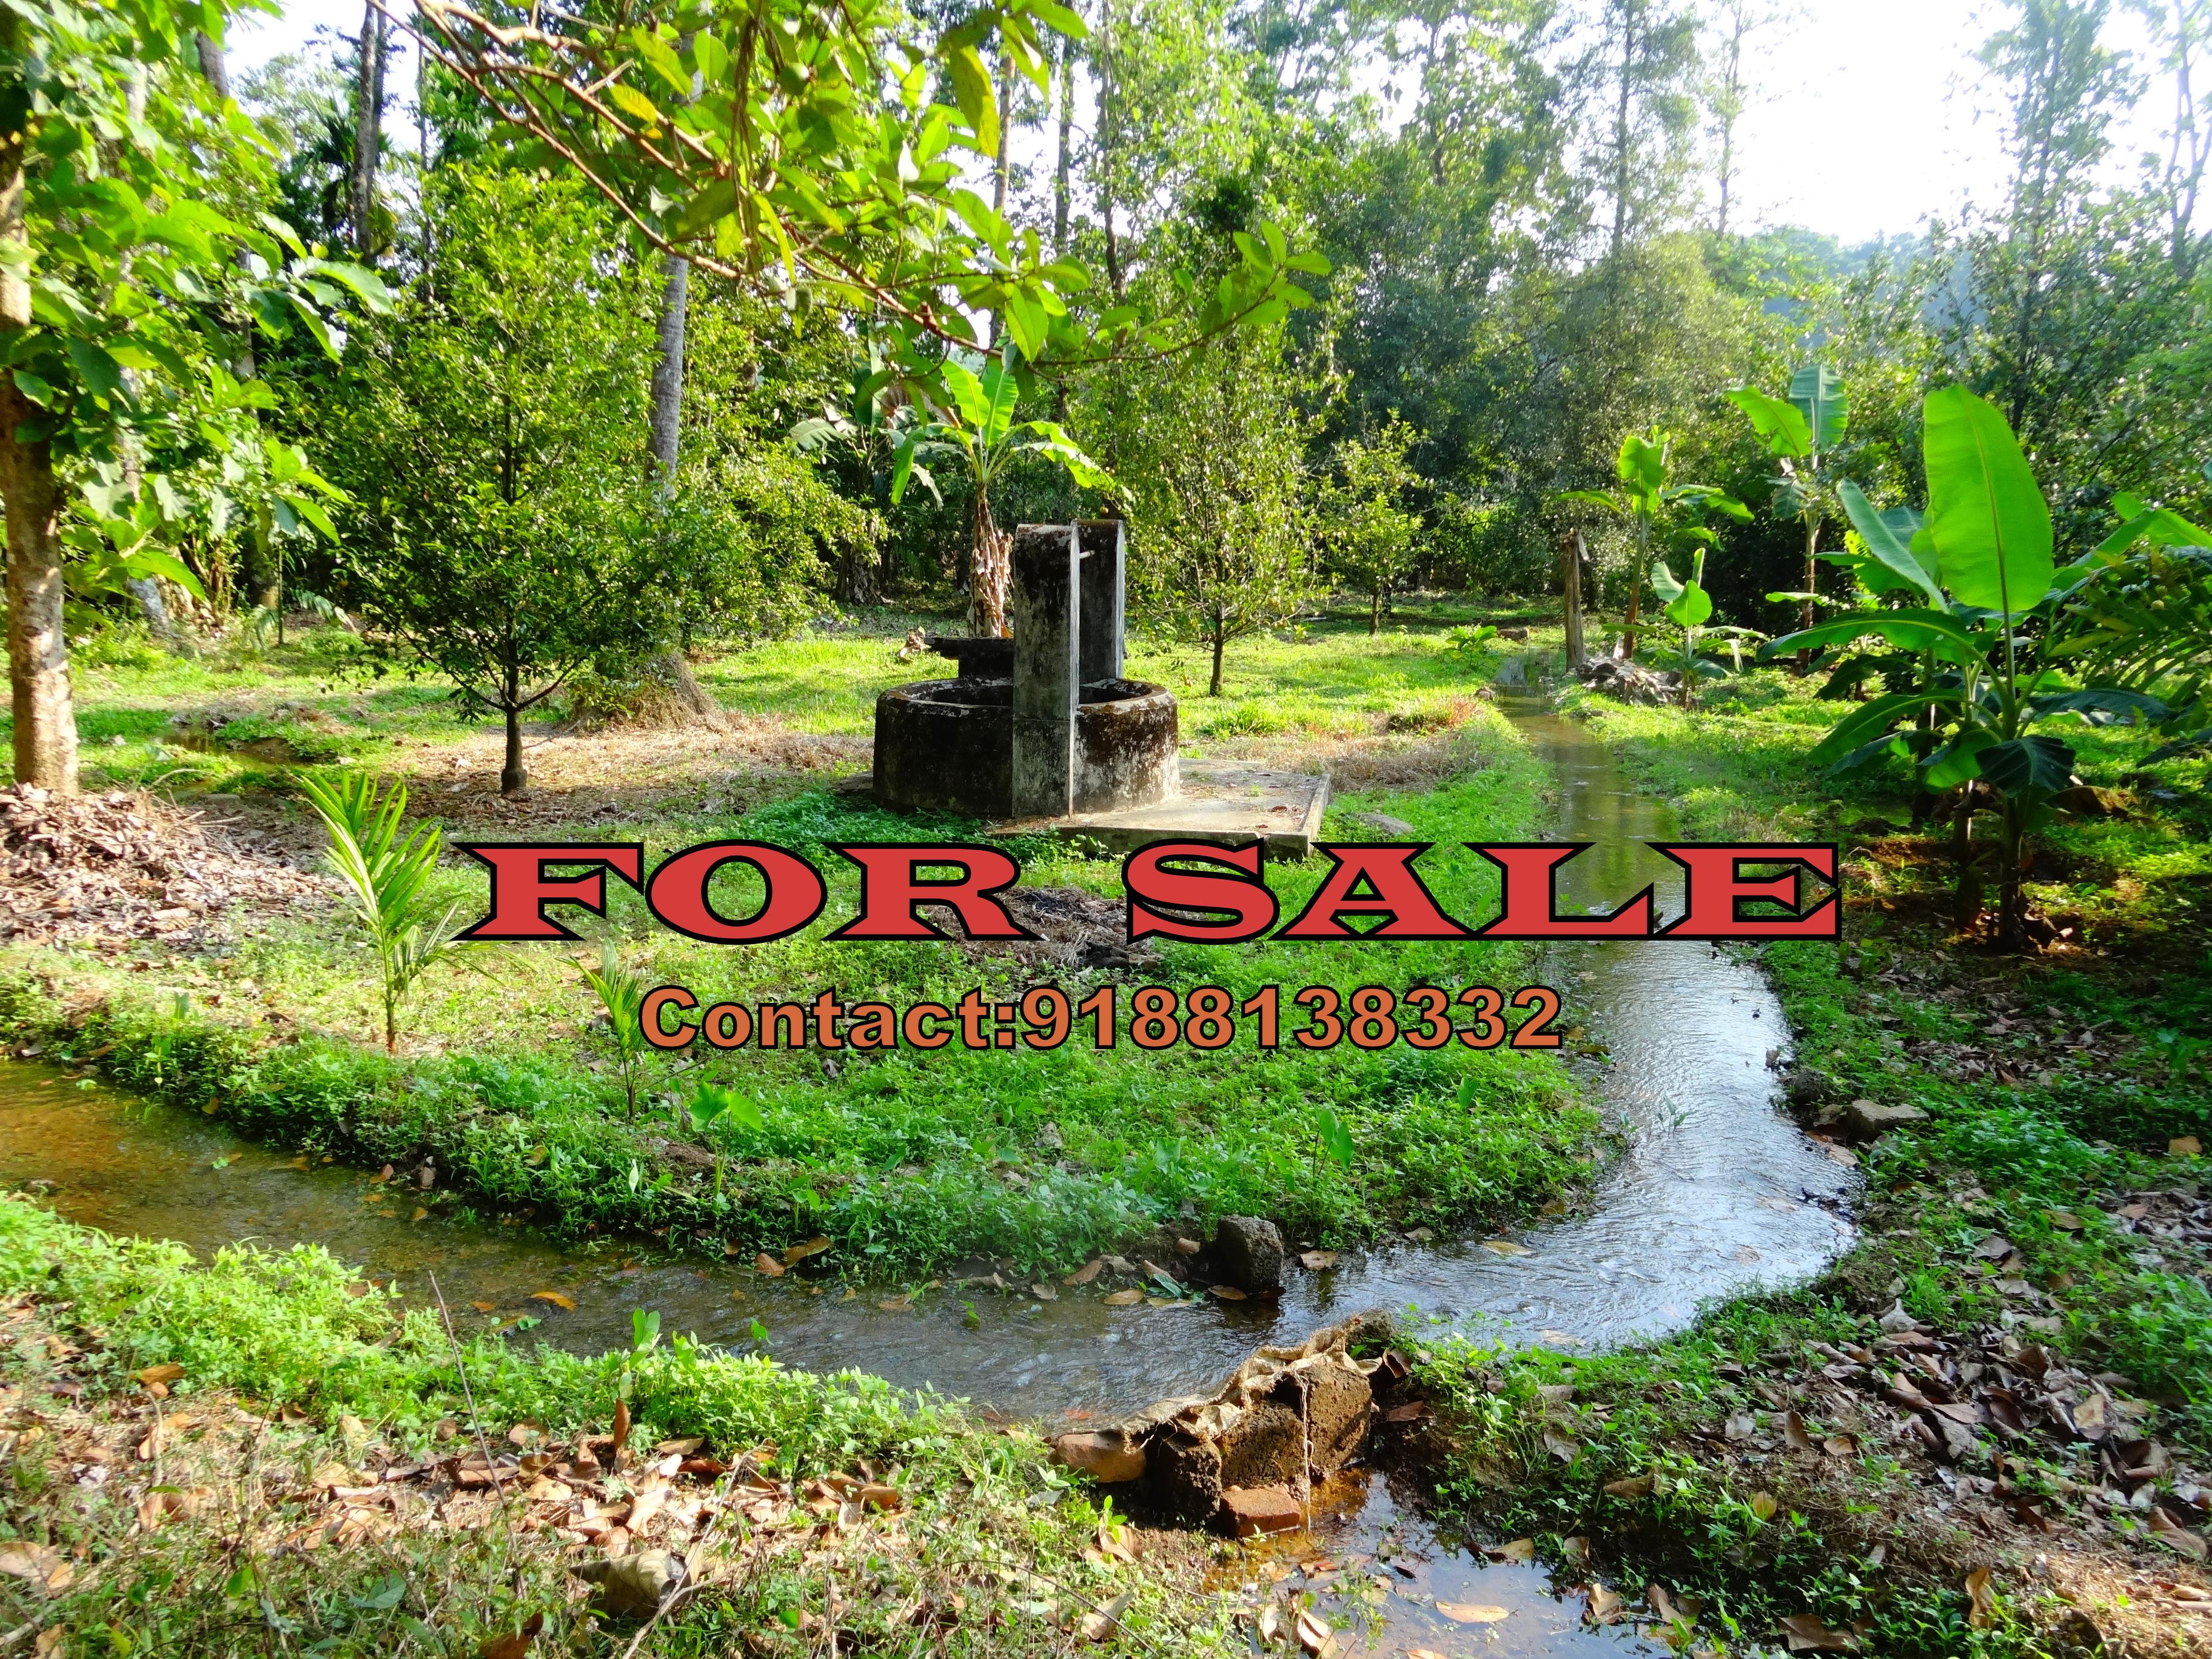 25 Cents Residential plot for sale Velloor, Mavallooor, Piravom